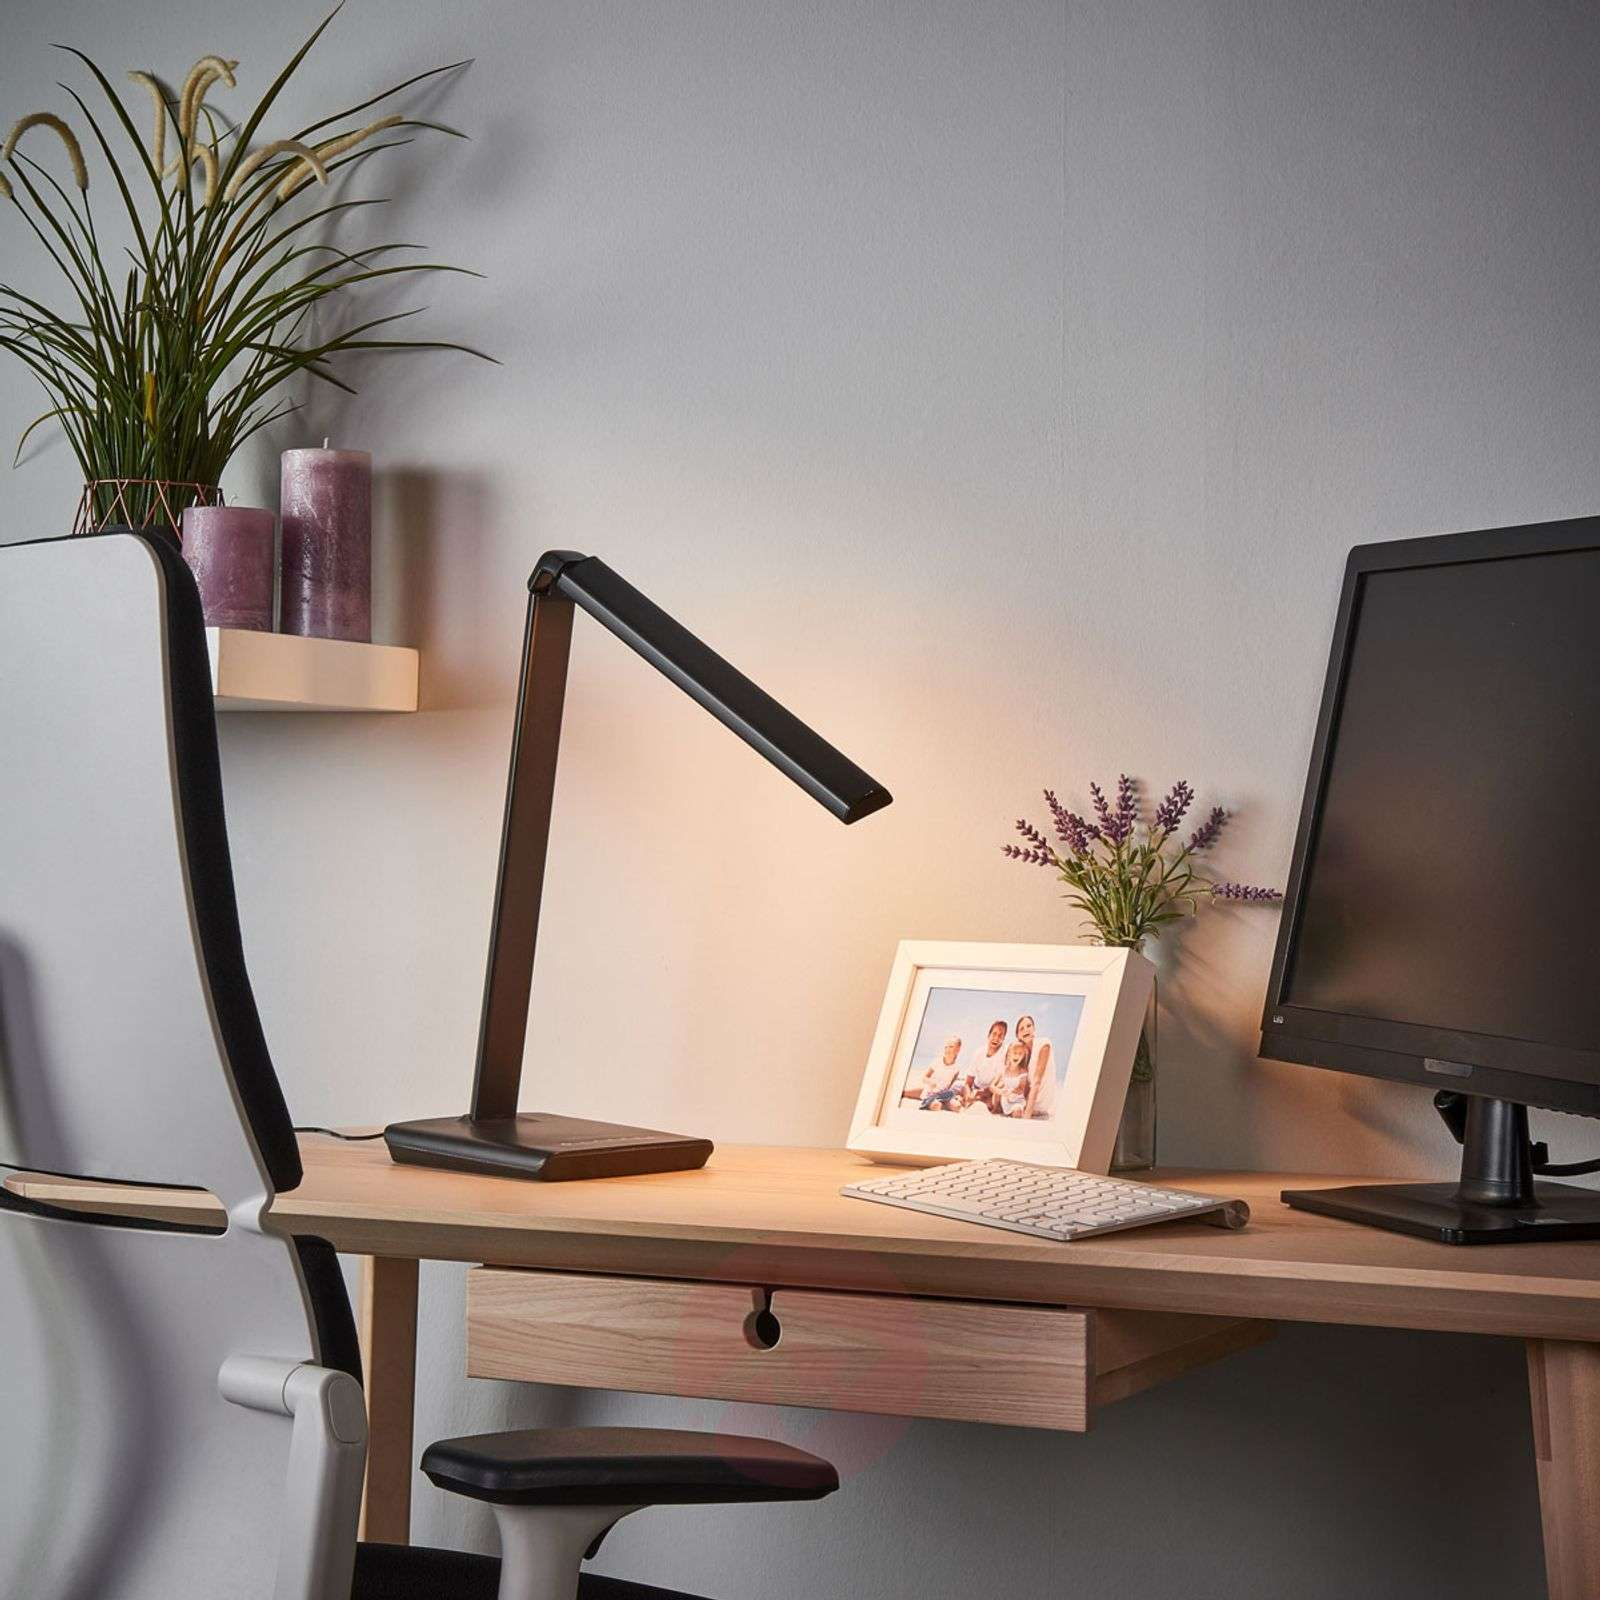 Kuno LED desk lamp with USB port-9643035-02